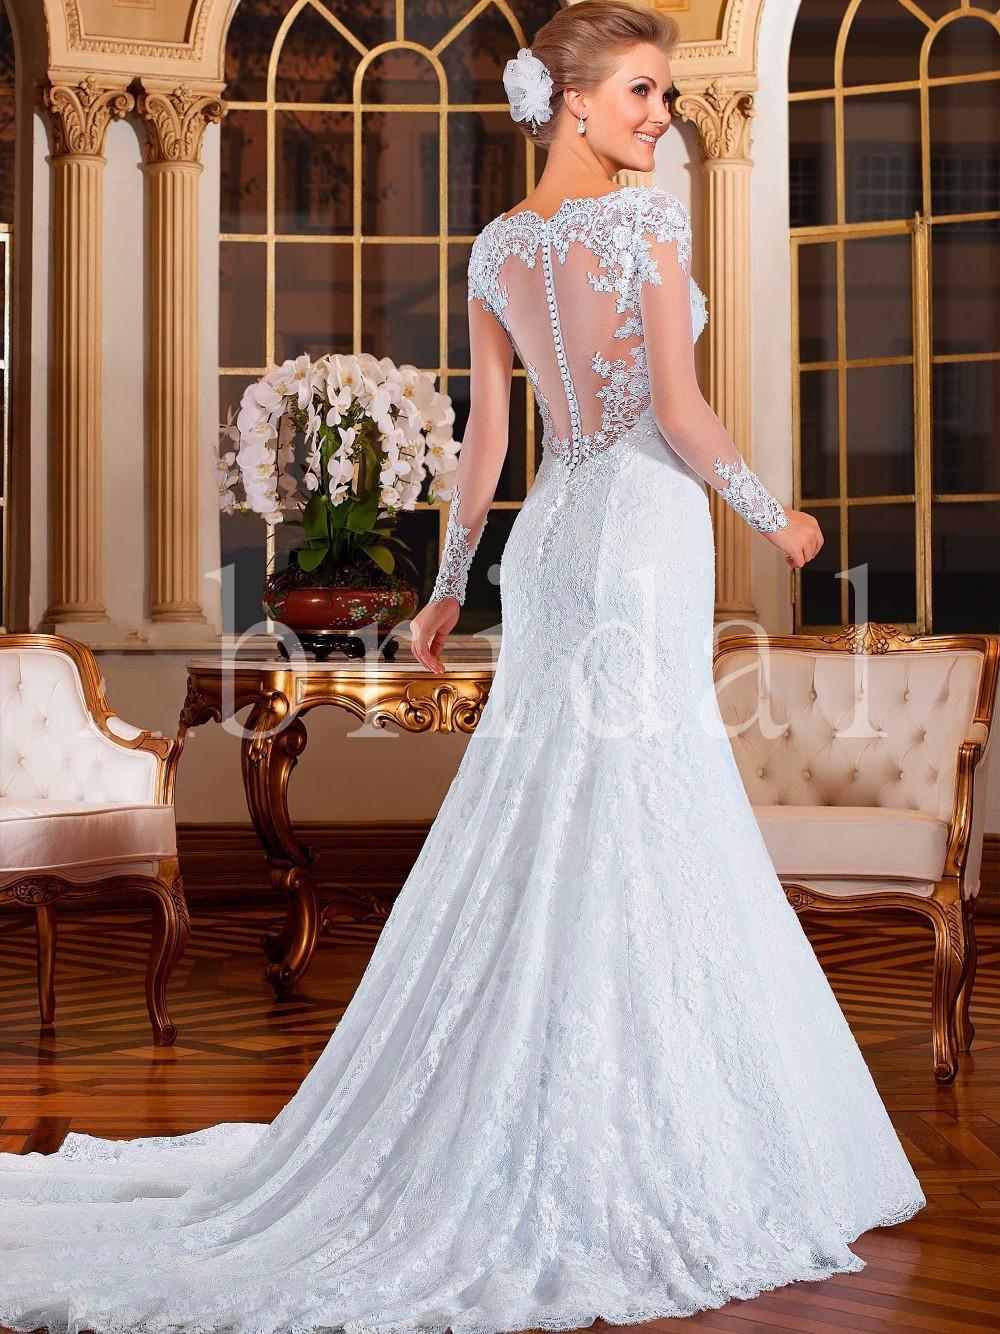 Free Wedding Fonts For Your Diy Invitations: Crochet Wedding Dress Patterns Free